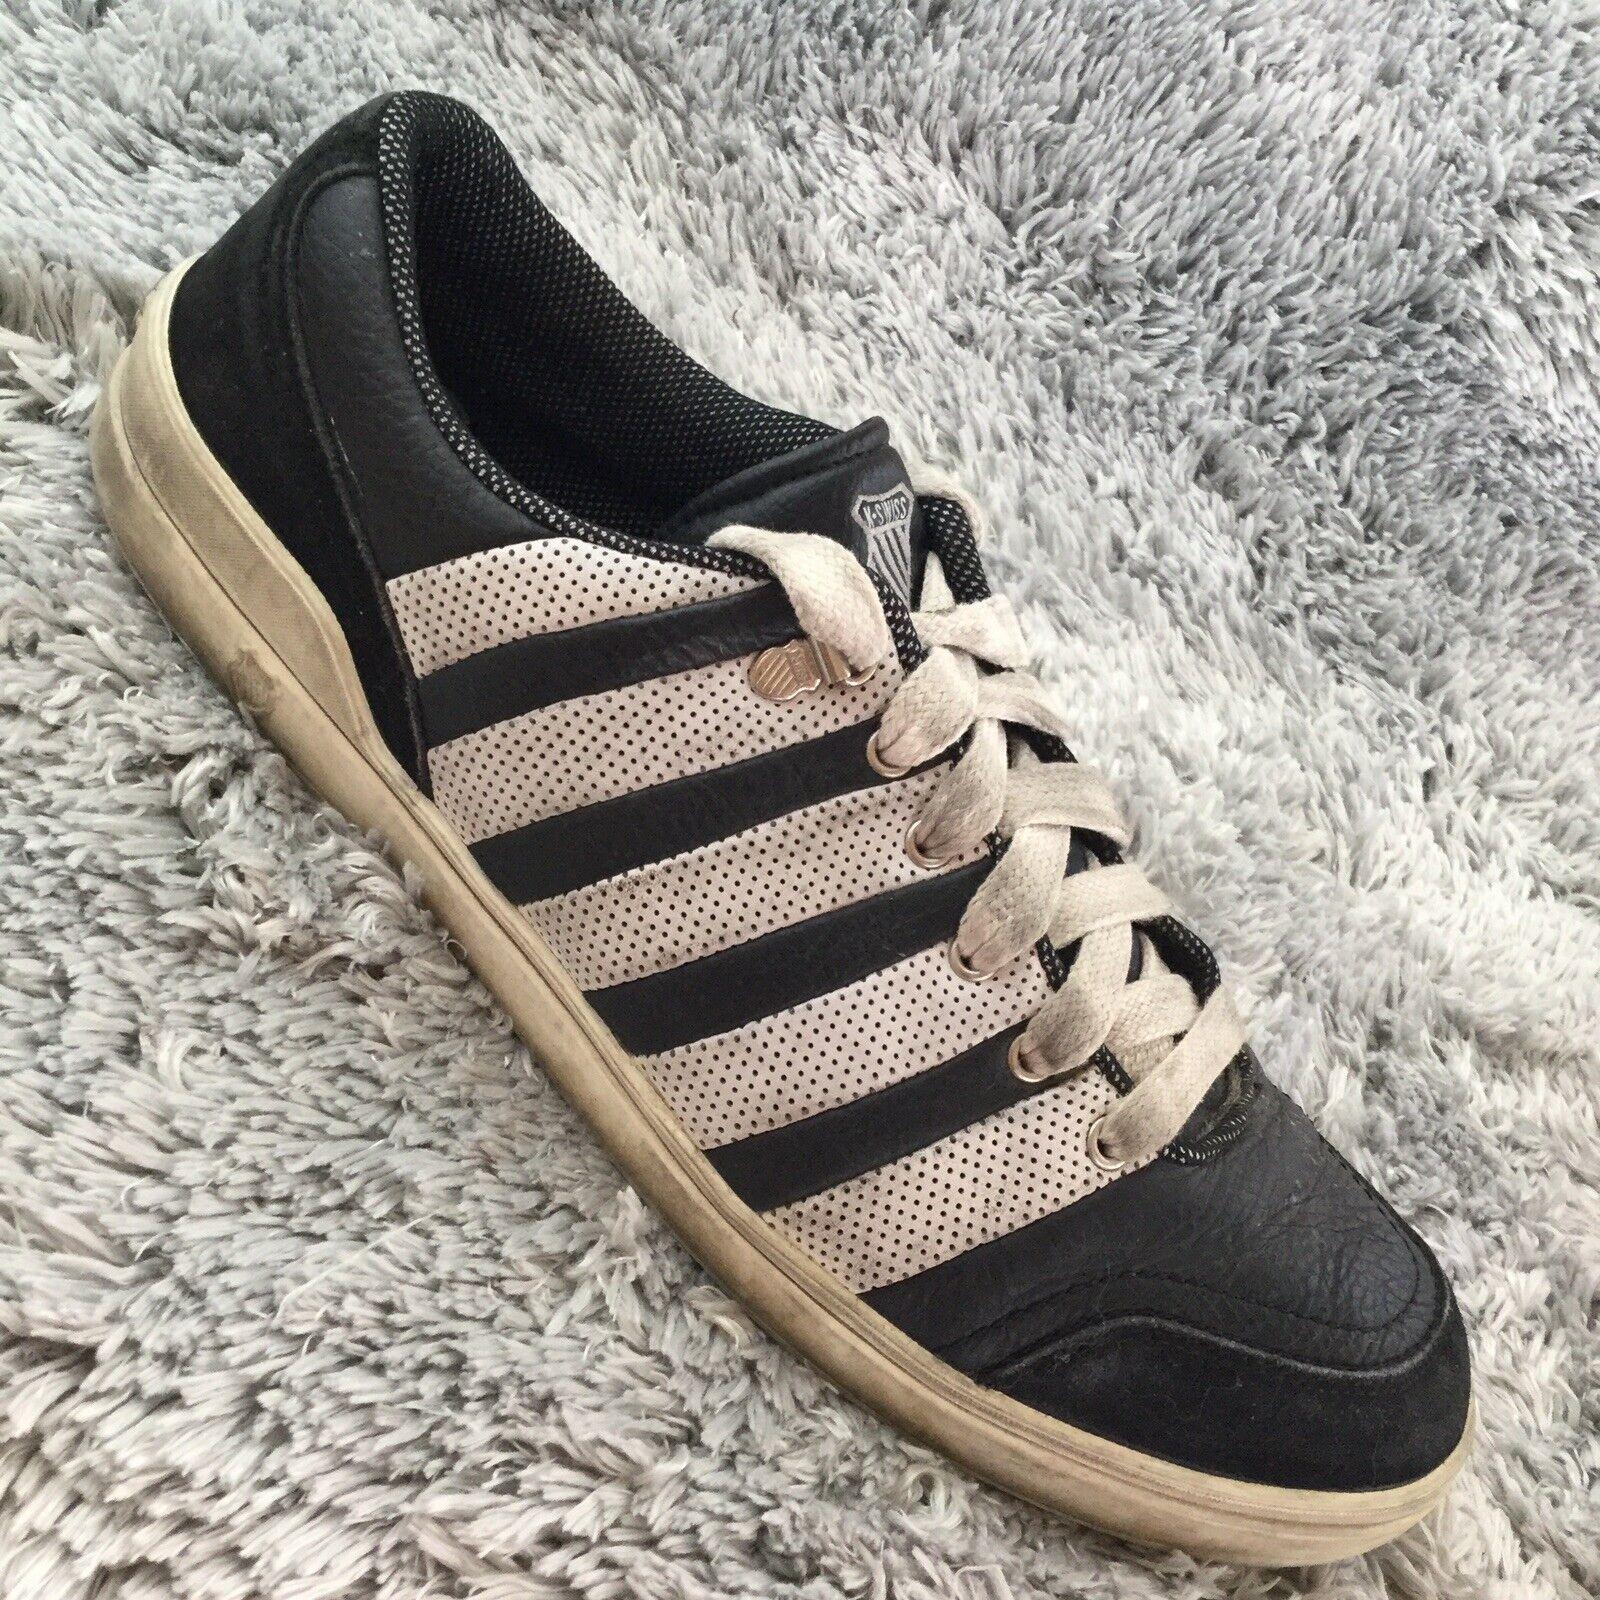 K Swiss Low Kayswiss Black White 02300002 Mens Shoes Us 13/ Eur 47 J